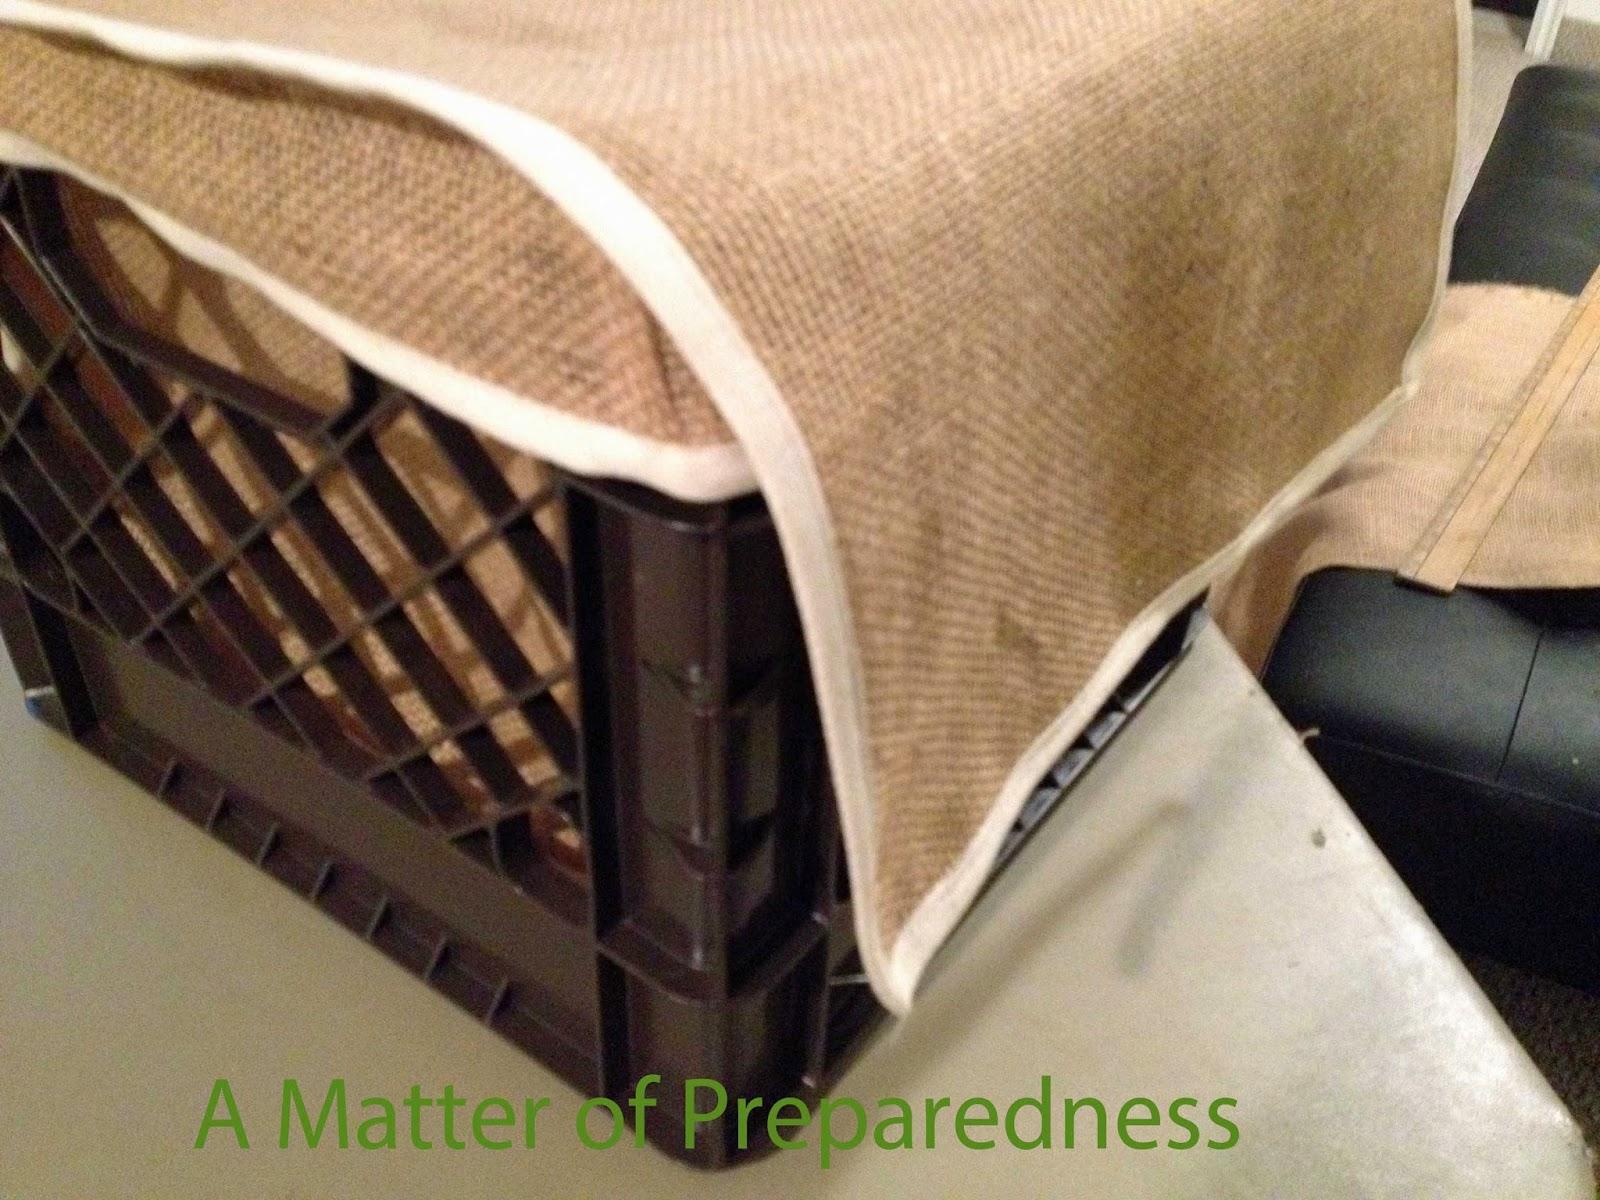 Portable Root Cellar : A matter of preparedness it s having root